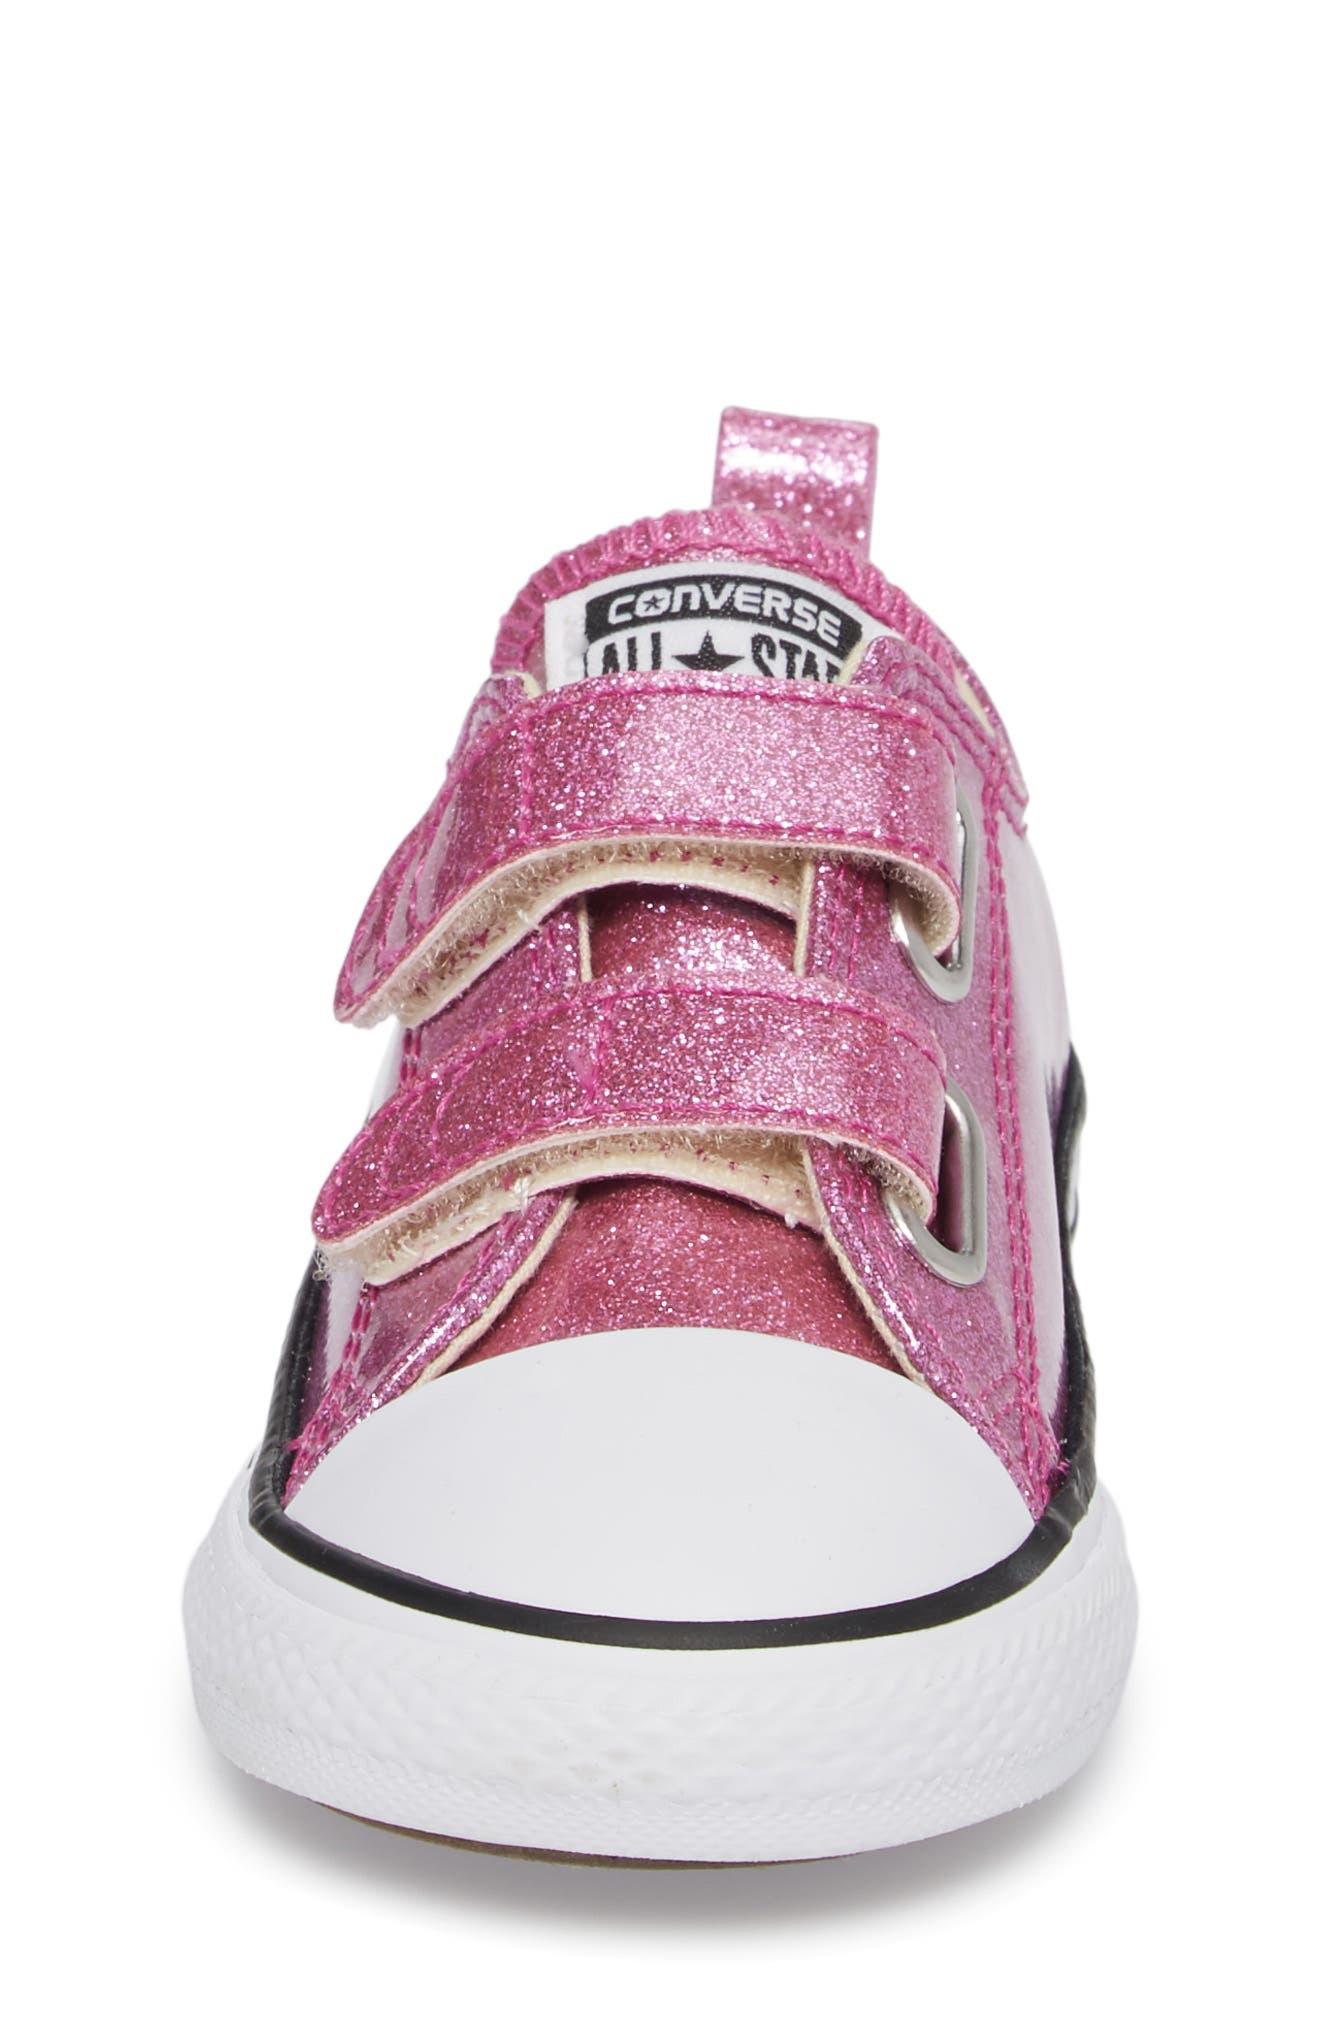 All Star<sup>®</sup> Seasonal Glitter Sneaker,                             Alternate thumbnail 4, color,                             Bright Violet